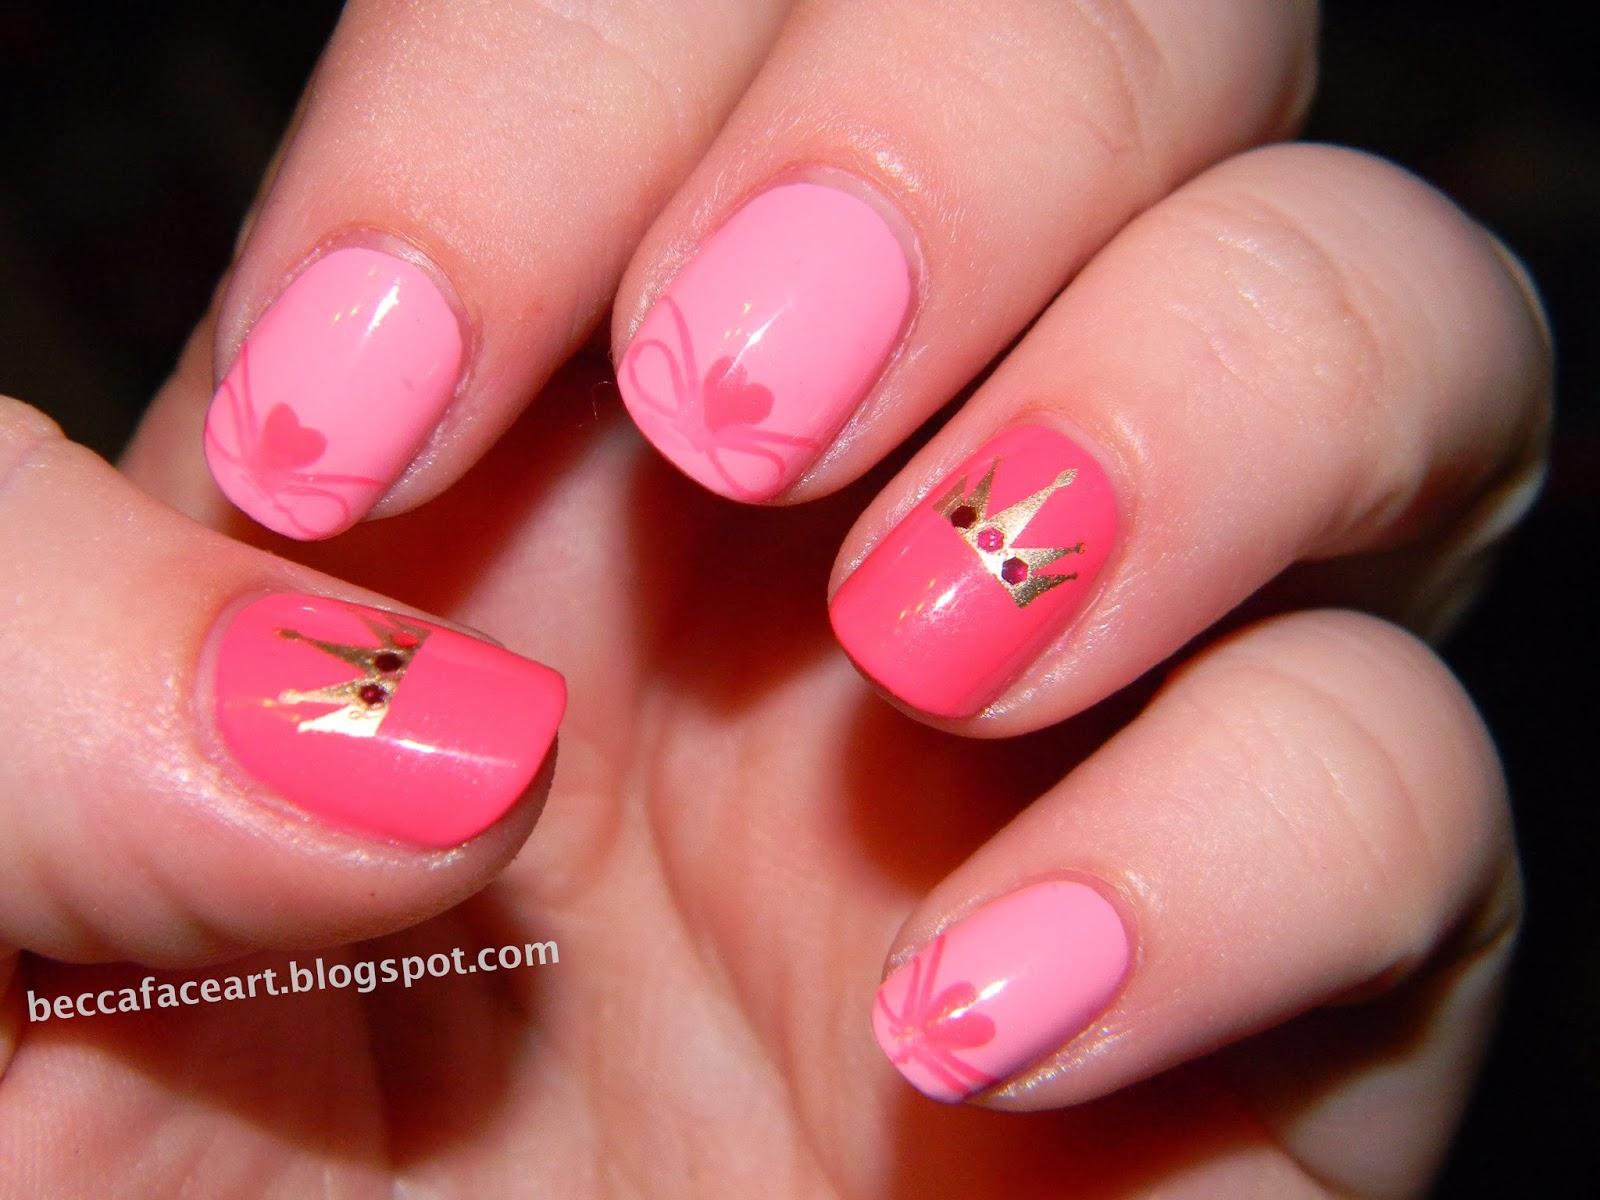 Becca Face Nail Art: Pretty Pretty Princess Nails